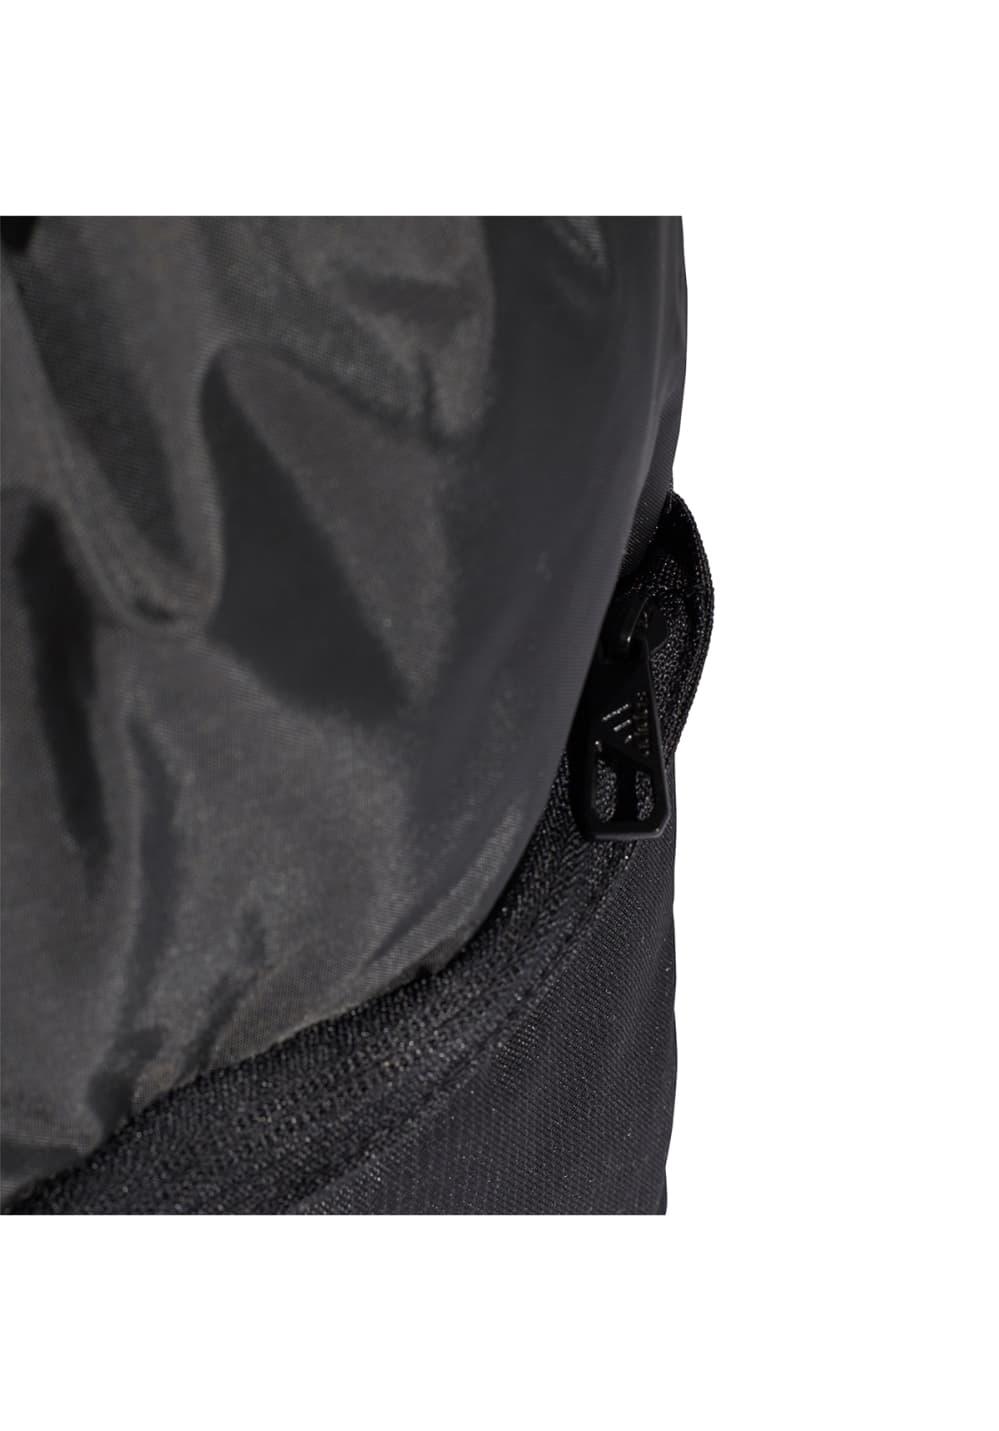 bfa7ecf576a0 adidas 3-Stripes Gym Bag - Bags - Black